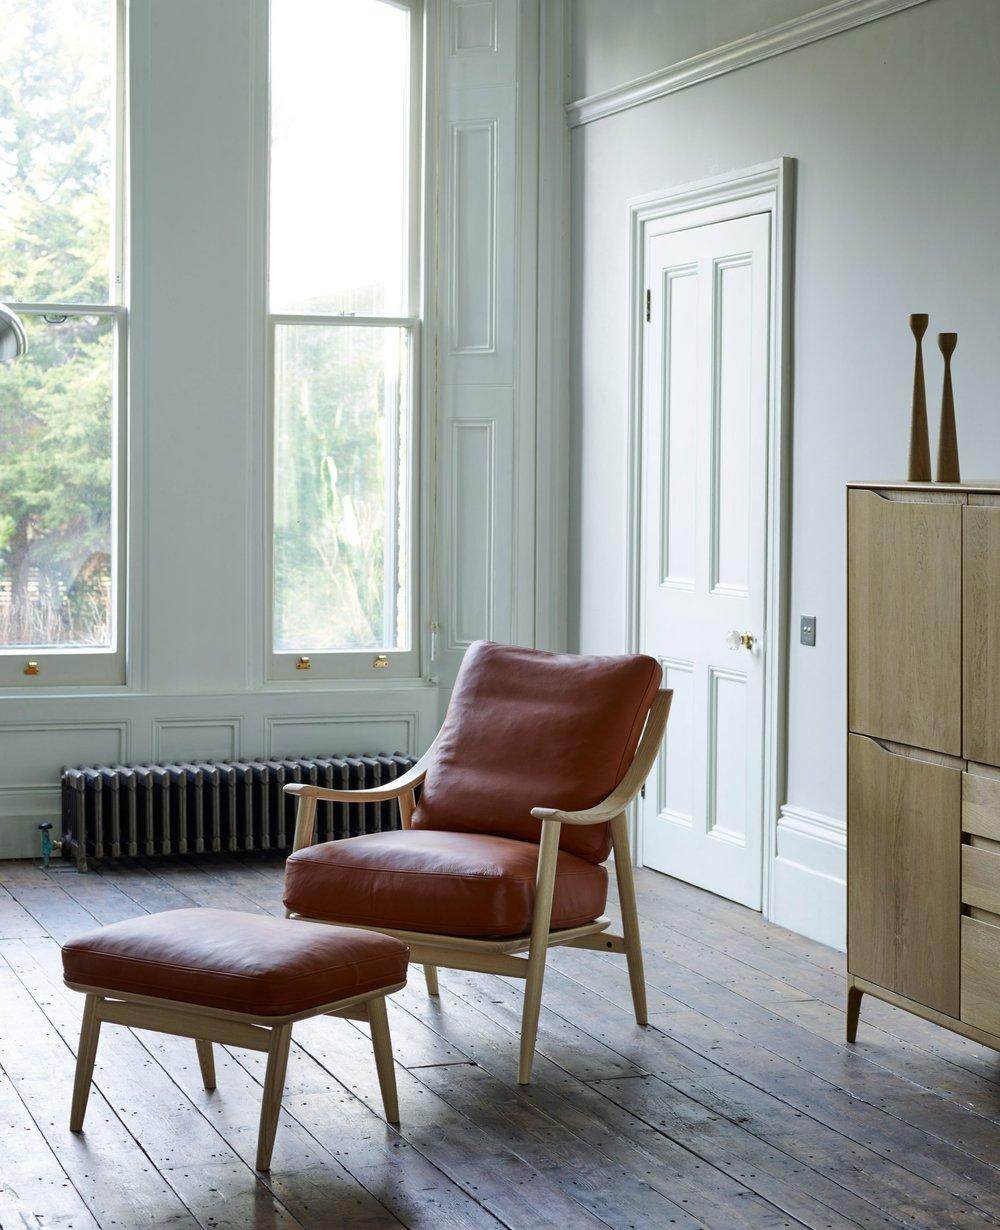 marino-chair-sofa-ercol-furniture-milan-design-week-2017_dezeen_2364_col_3-e1490971392854.jpg